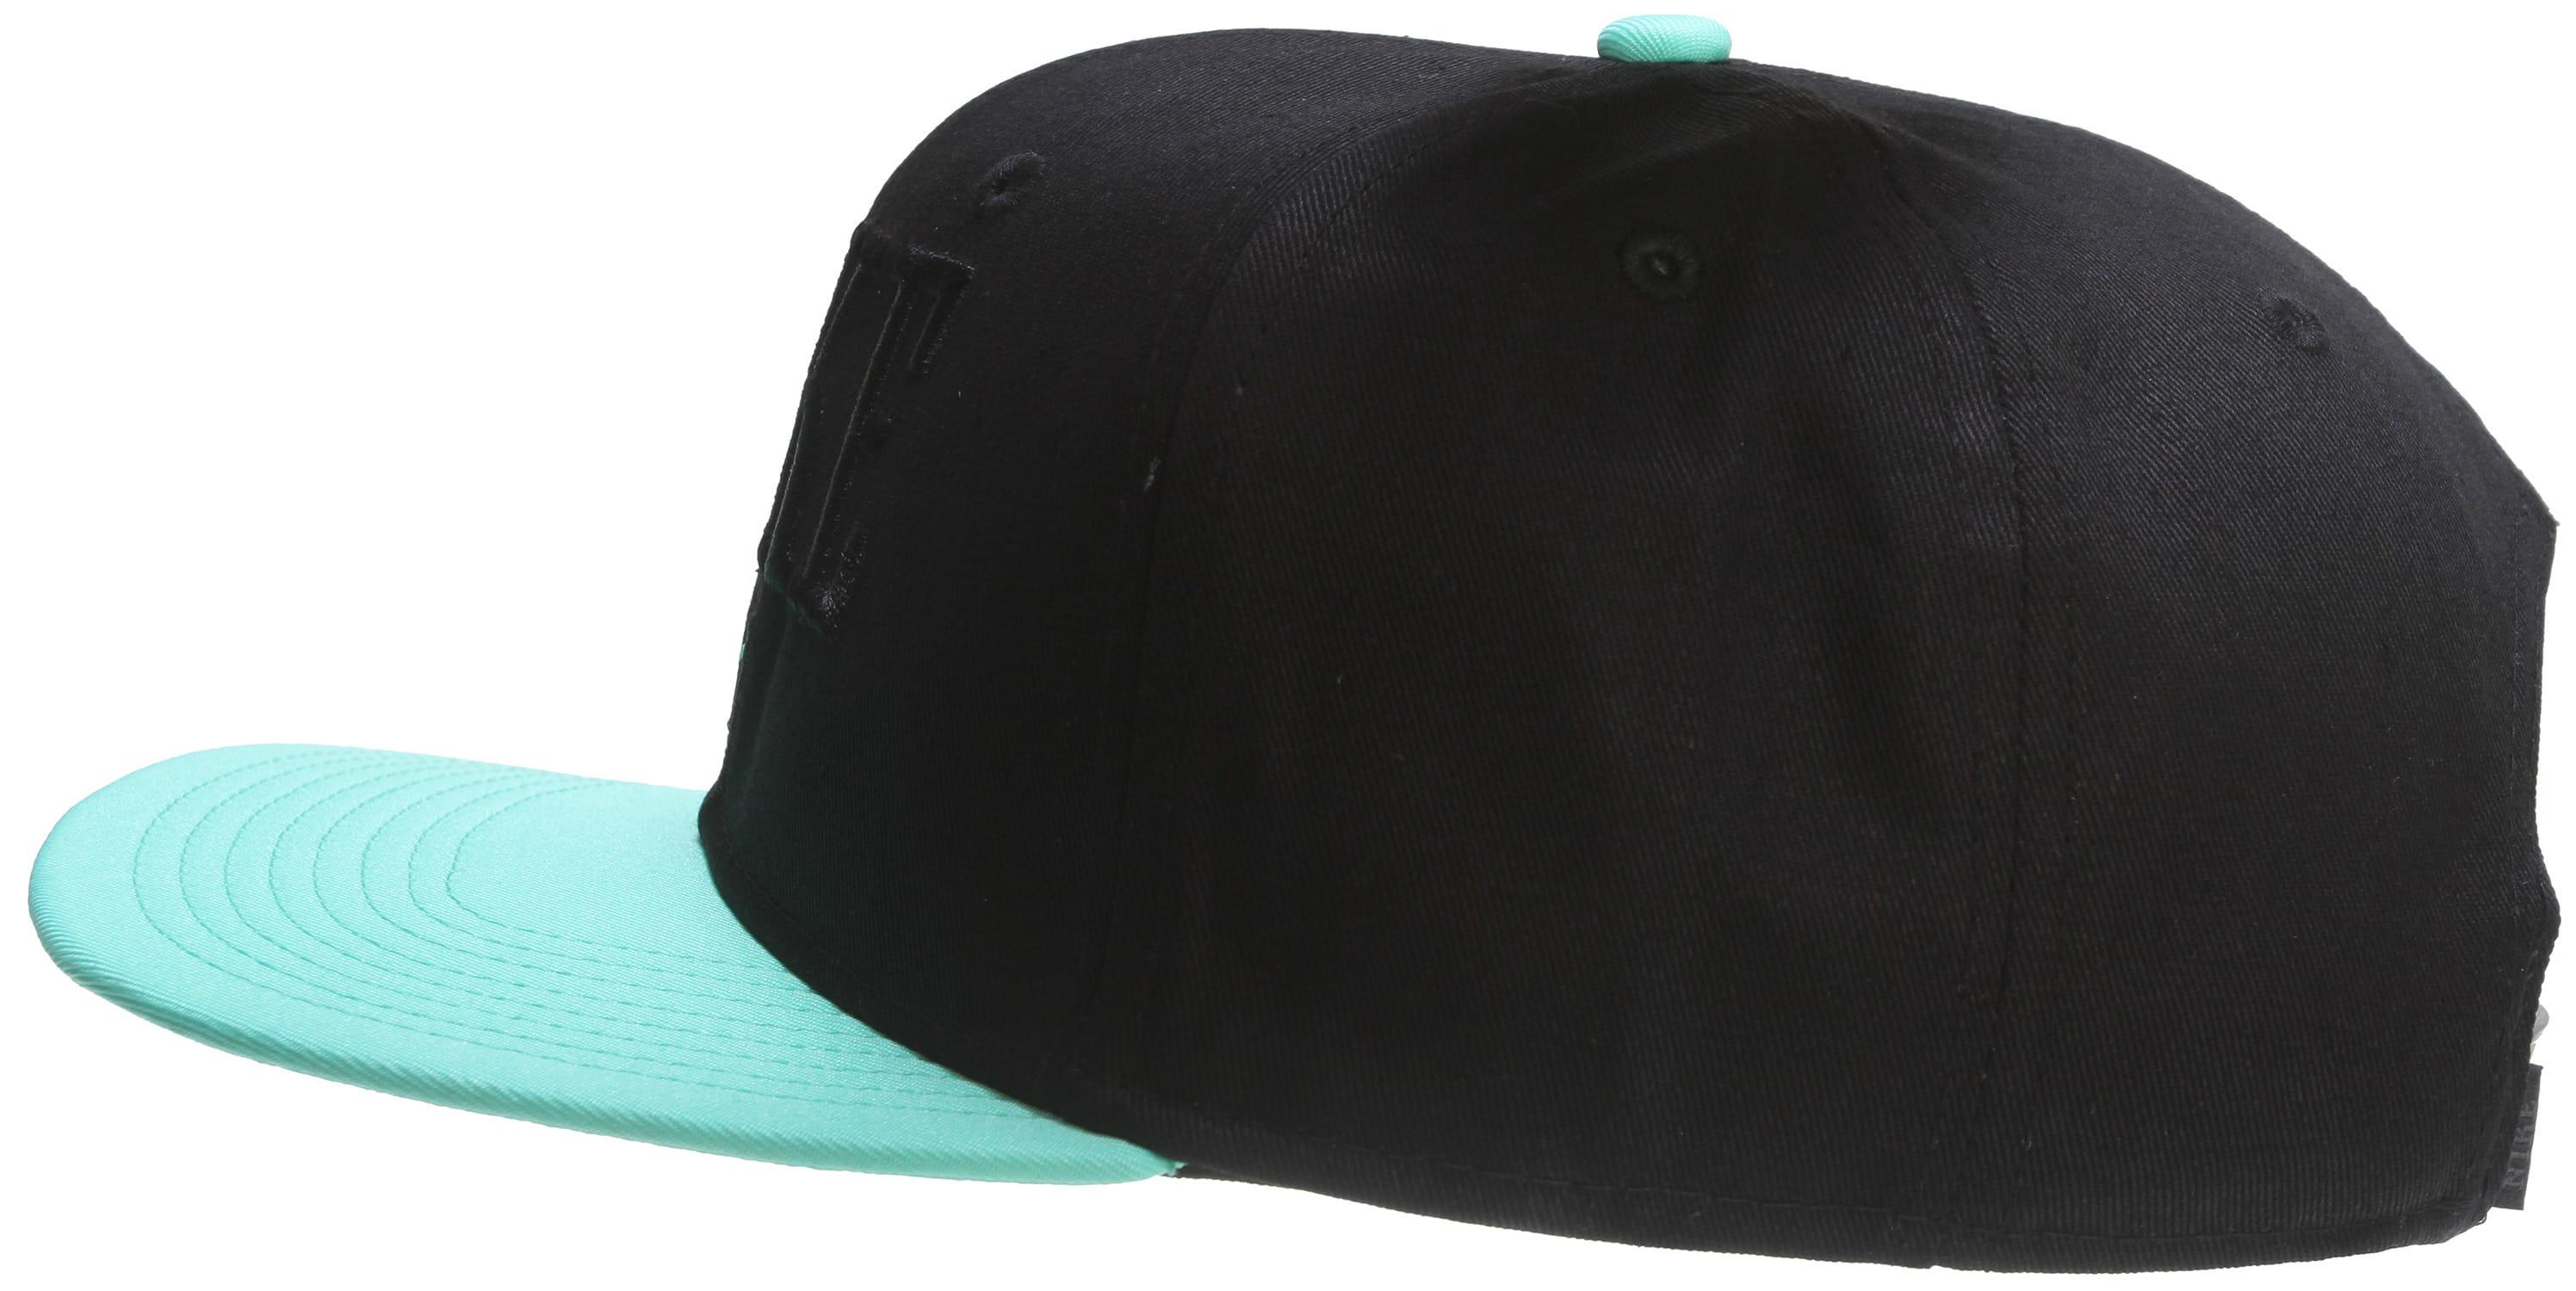 c65240b4468 buy nike snapback turquoise b71e8 e82ff